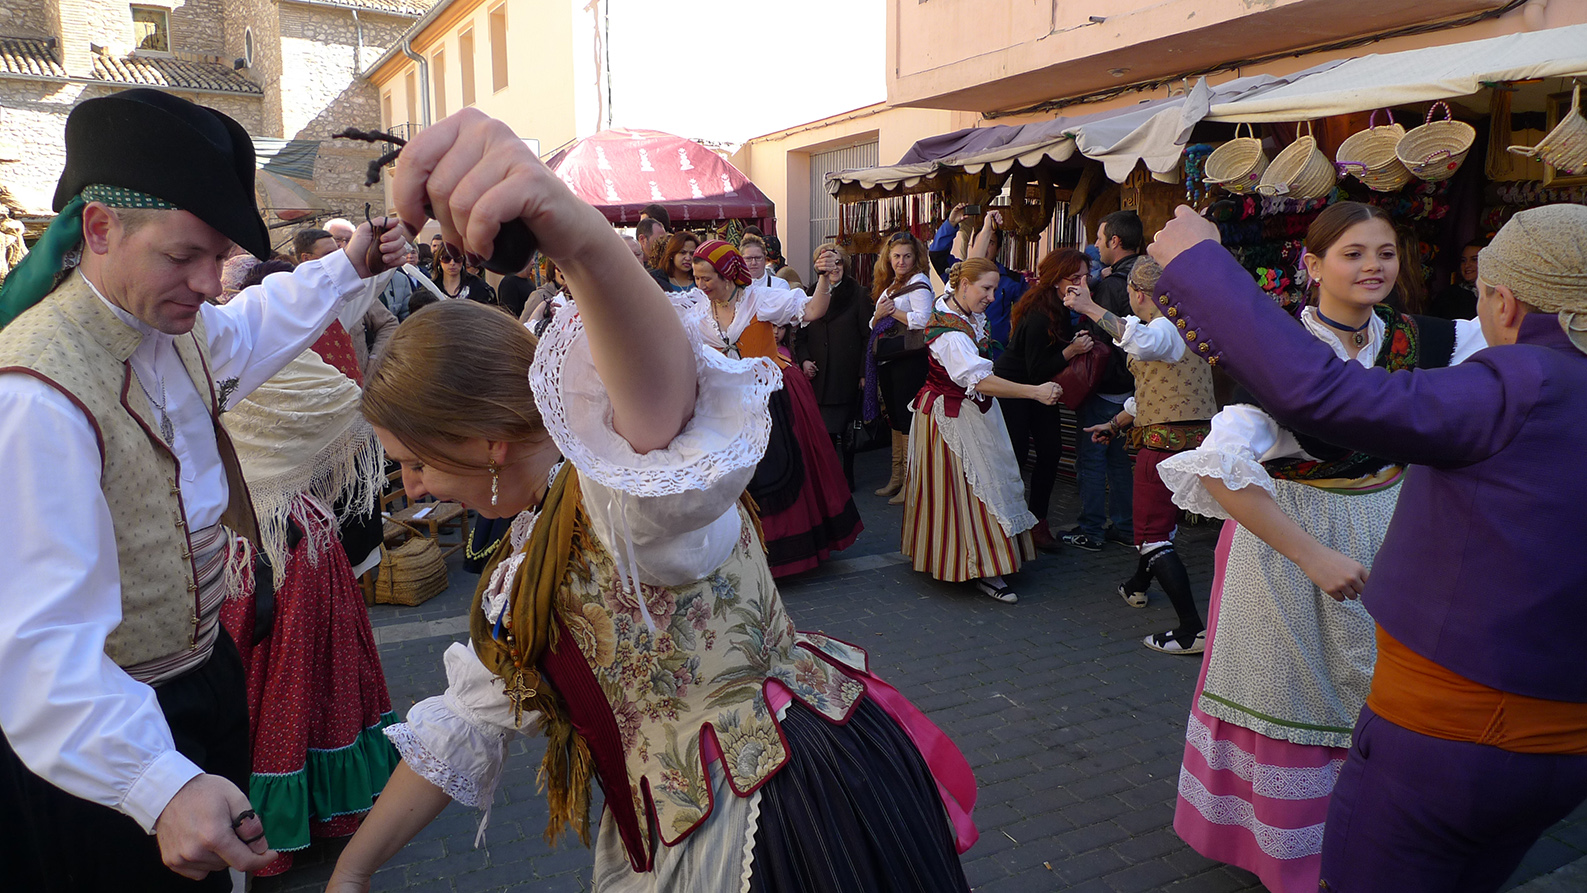 2014-02-23 - Baladre a Fira St. Marcia-ROTOVA (57)